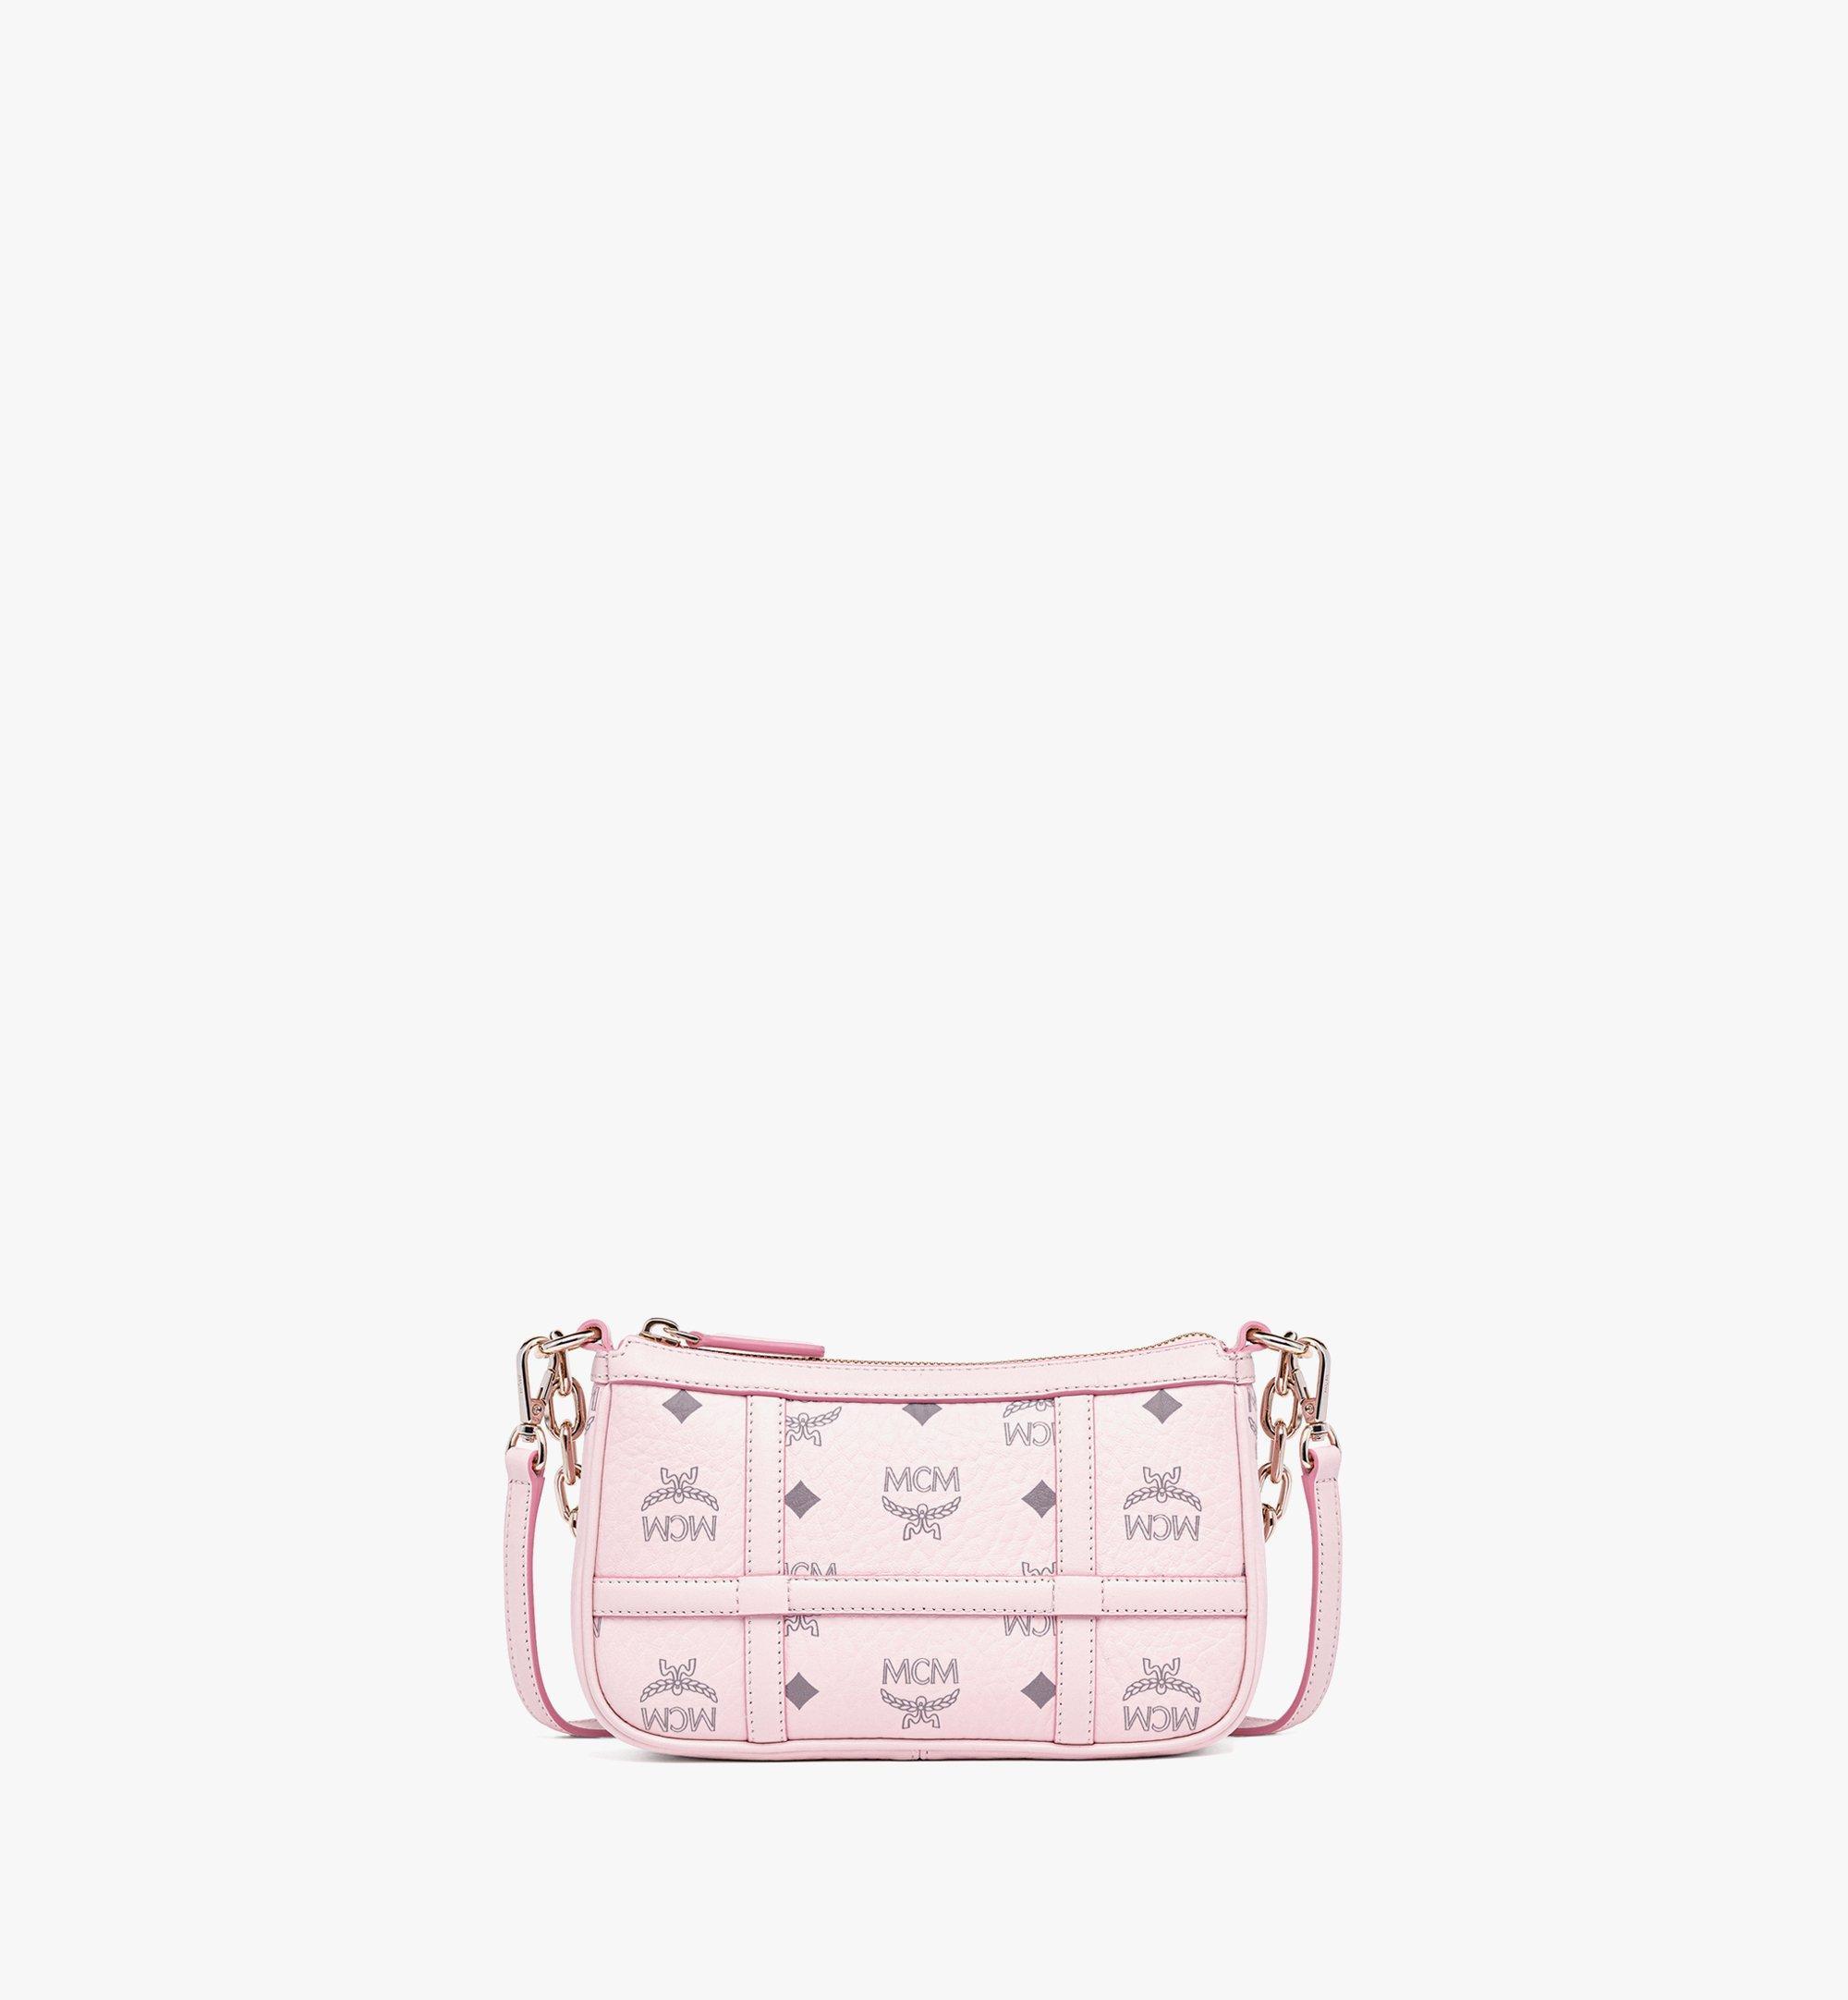 MCM Delmy Shoulder Bag in Visetos Pink MWSBAER01QH001 Alternate View 1